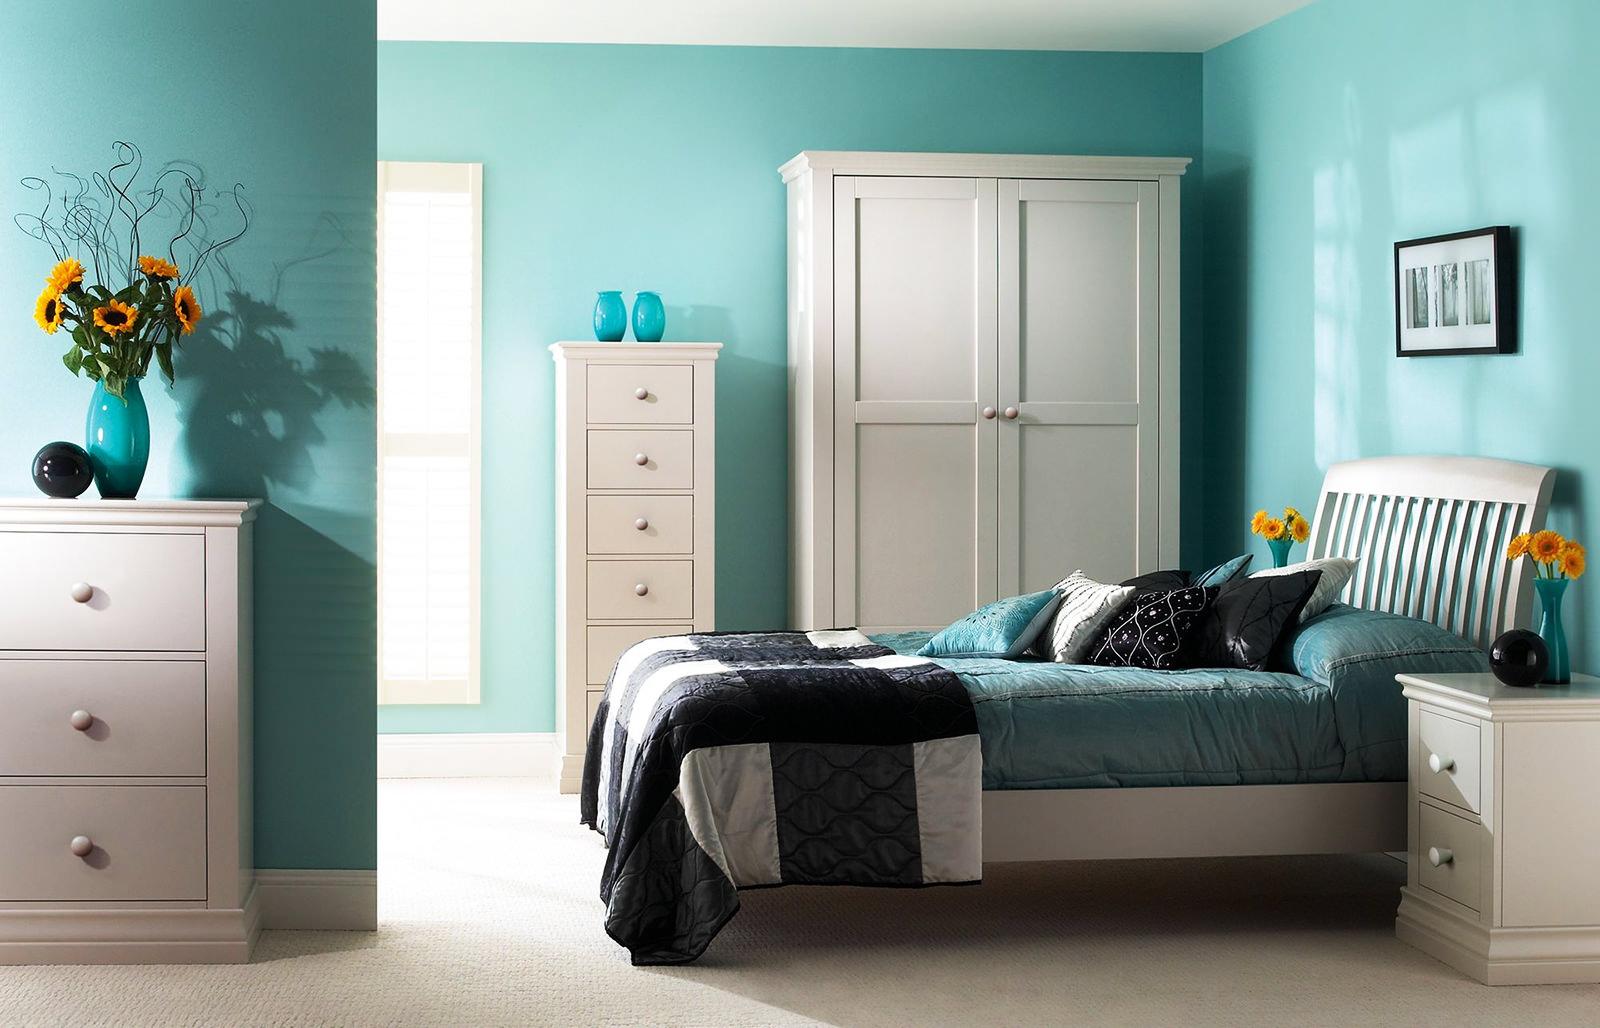 Брюзово-белая спальня в кантри стиле